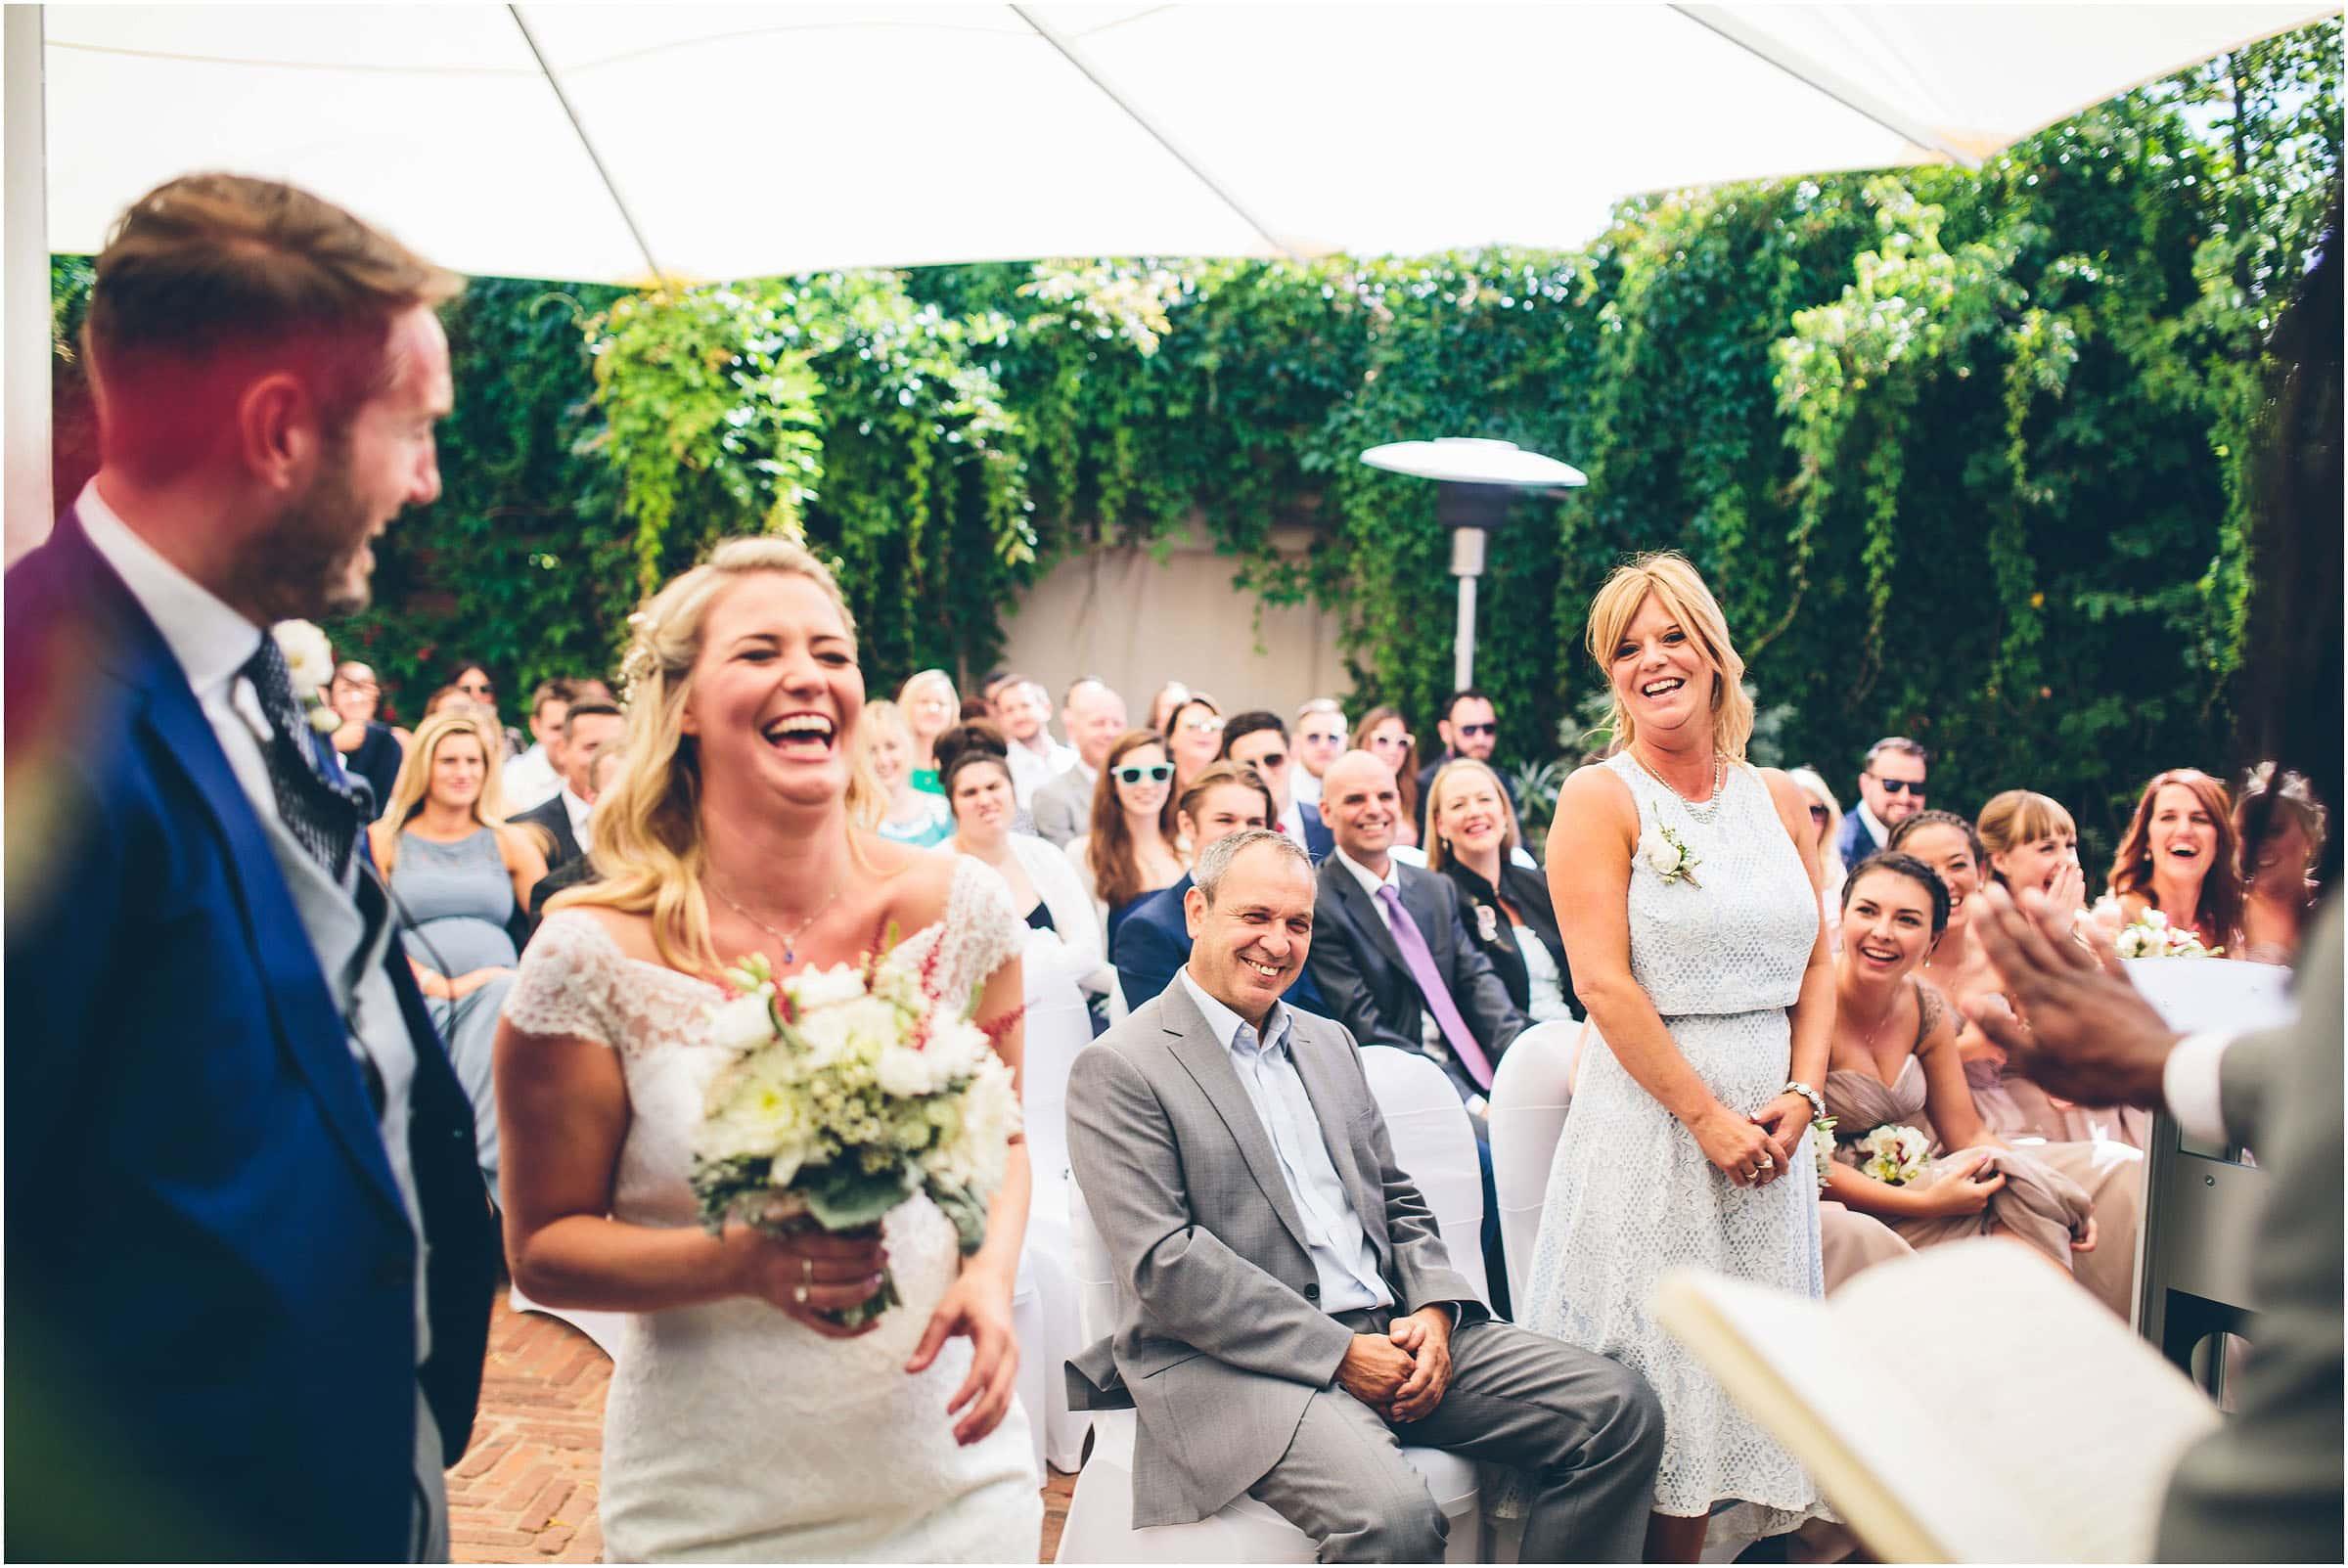 Kensington_Roof_Gardens_Wedding_Photography_0033